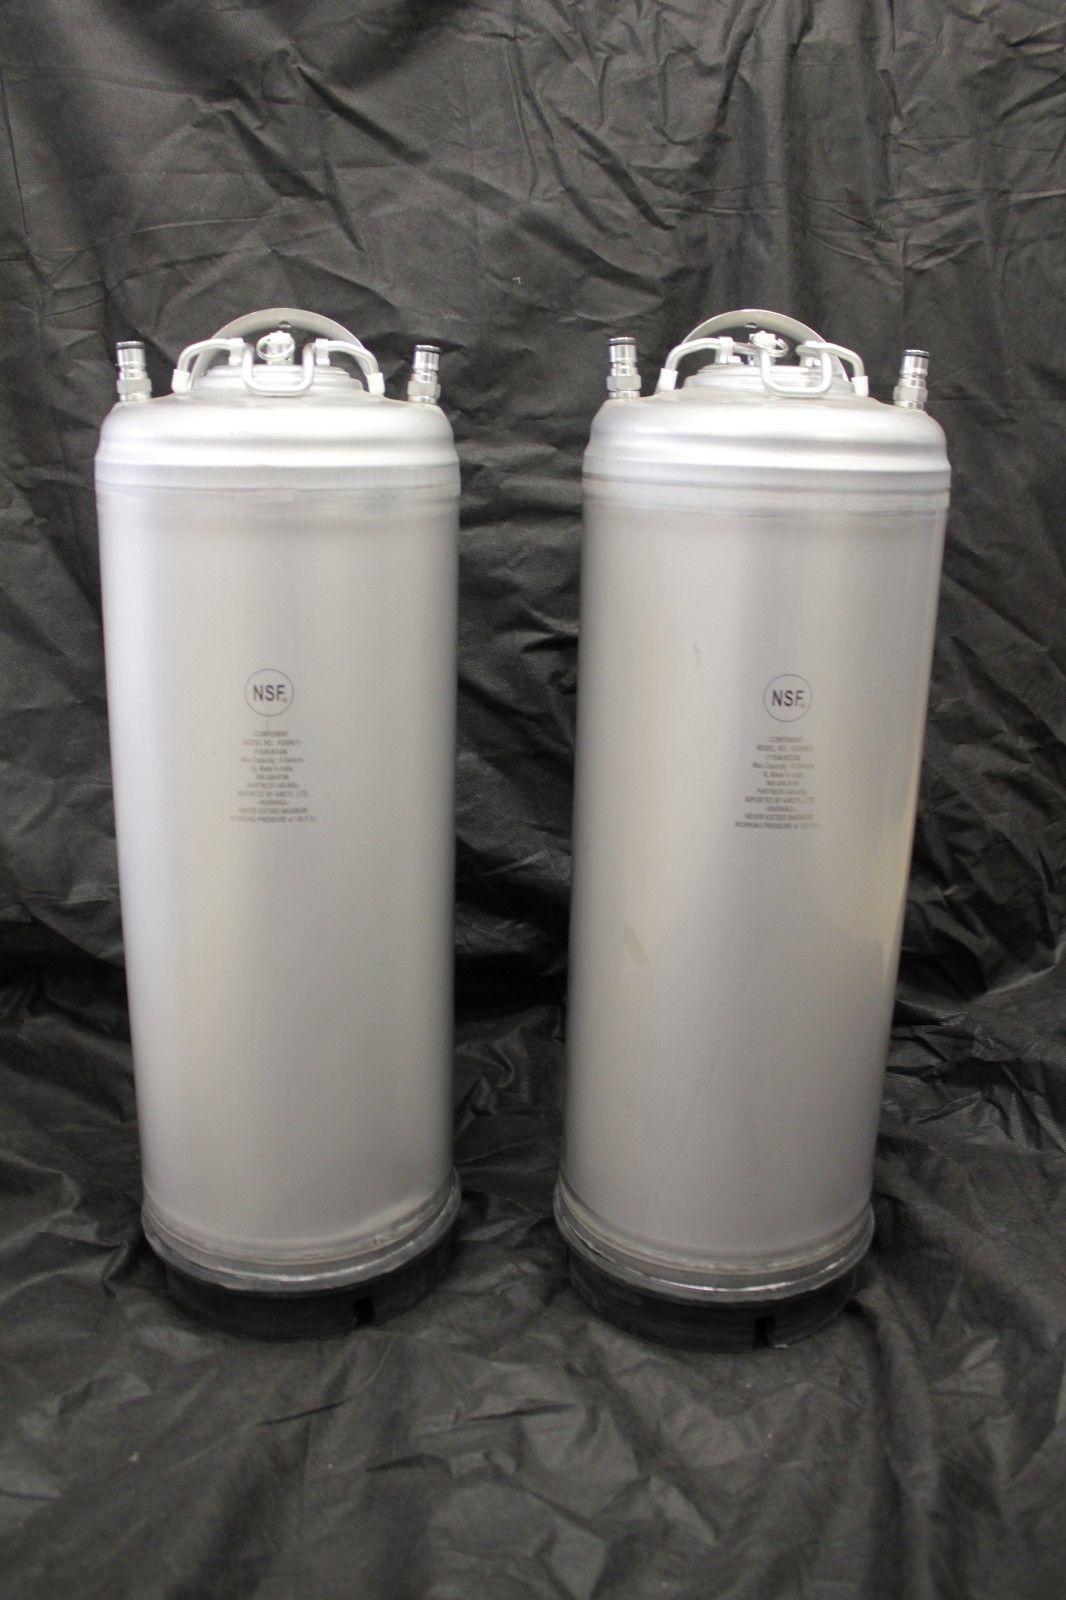 New 5 gallon ball lock corny keg 2 pack NSF approved